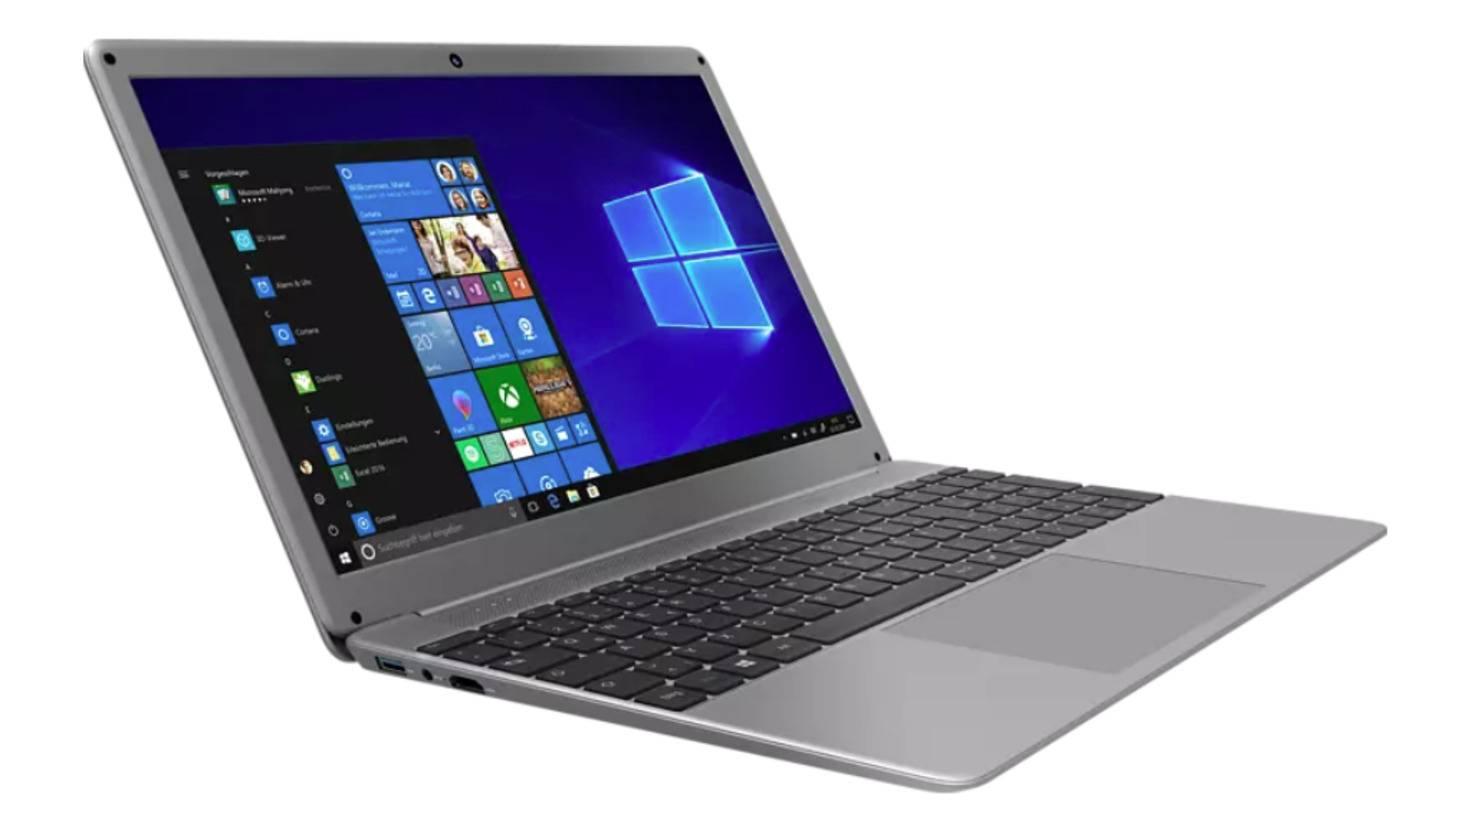 peaq-classic-pnb-c150-laptop-notebook